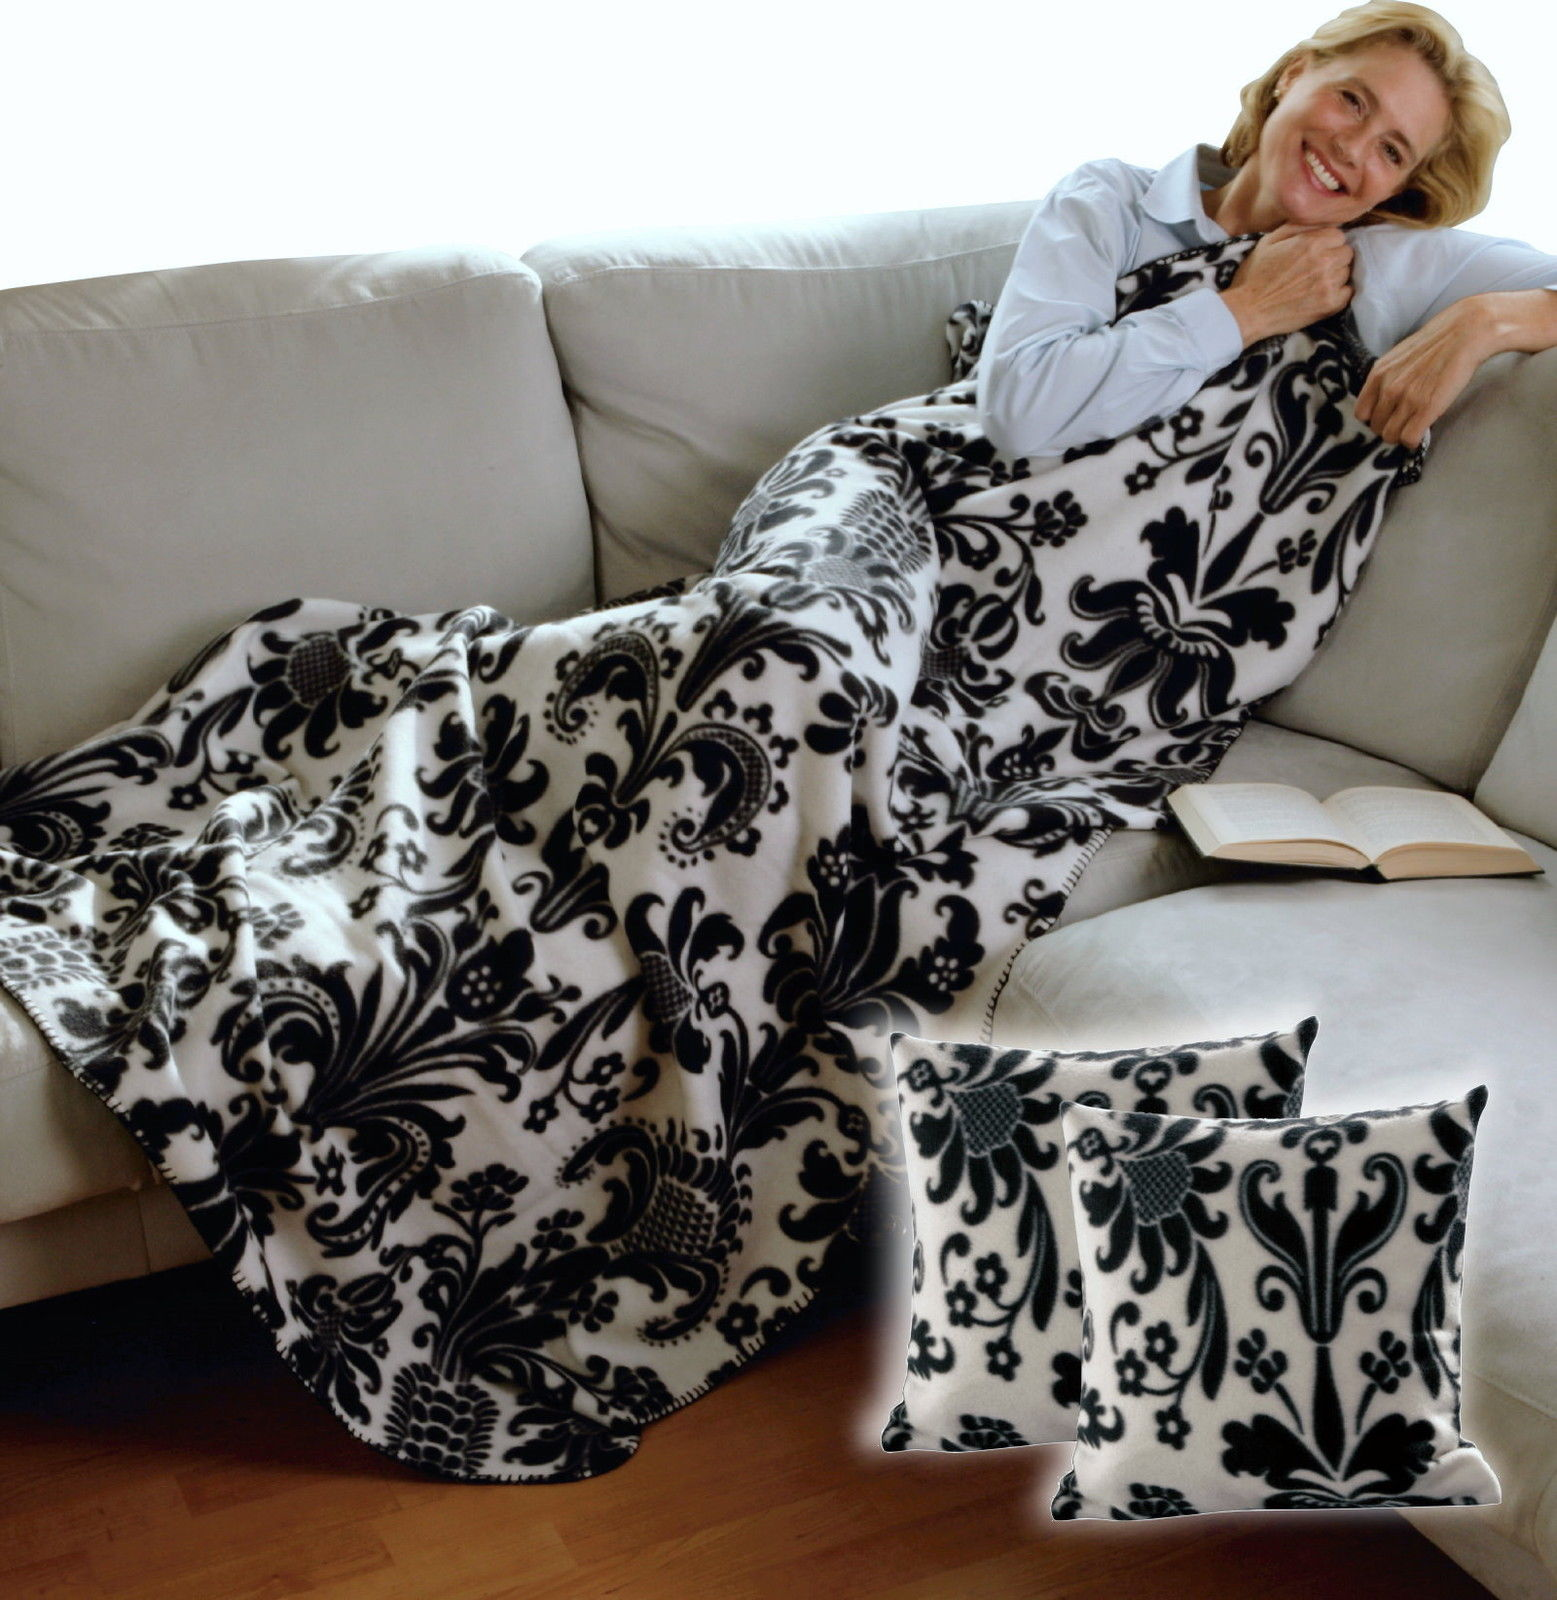 fleece decke 165x120 2x kissenbezug kuscheldecke wohndecke tagesdecke kissen ebay. Black Bedroom Furniture Sets. Home Design Ideas